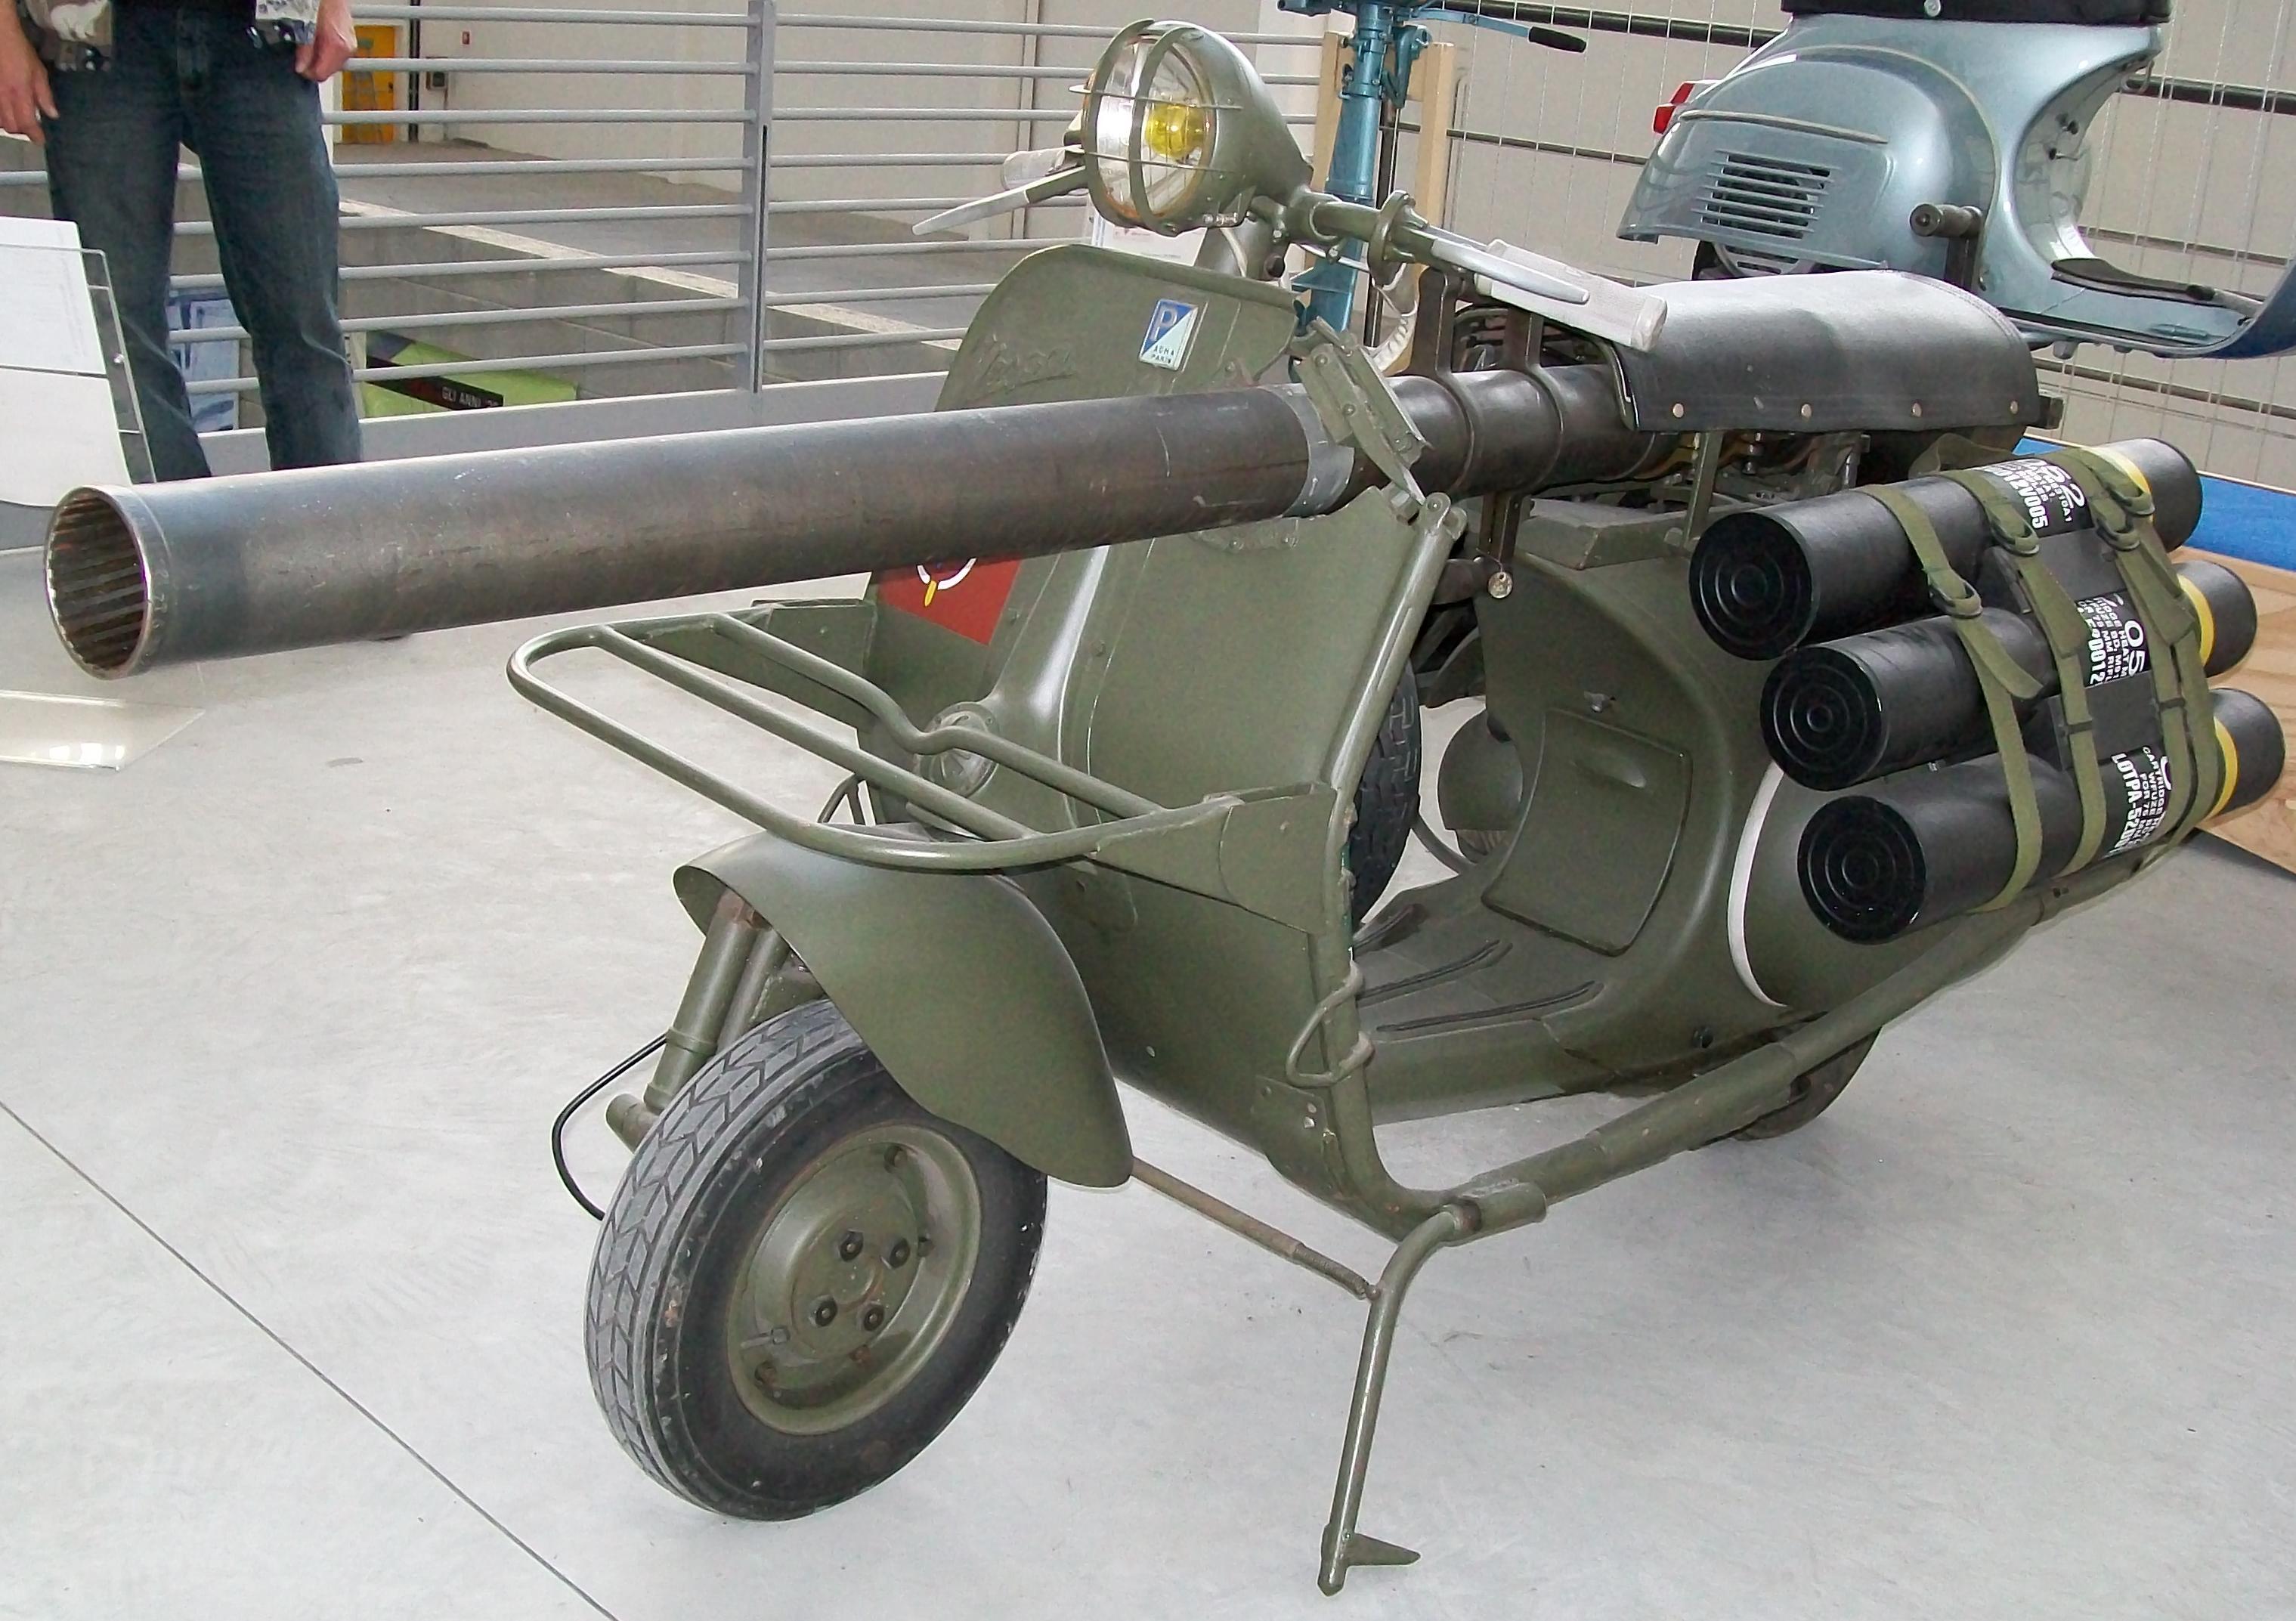 Vespa_militare2.JPG